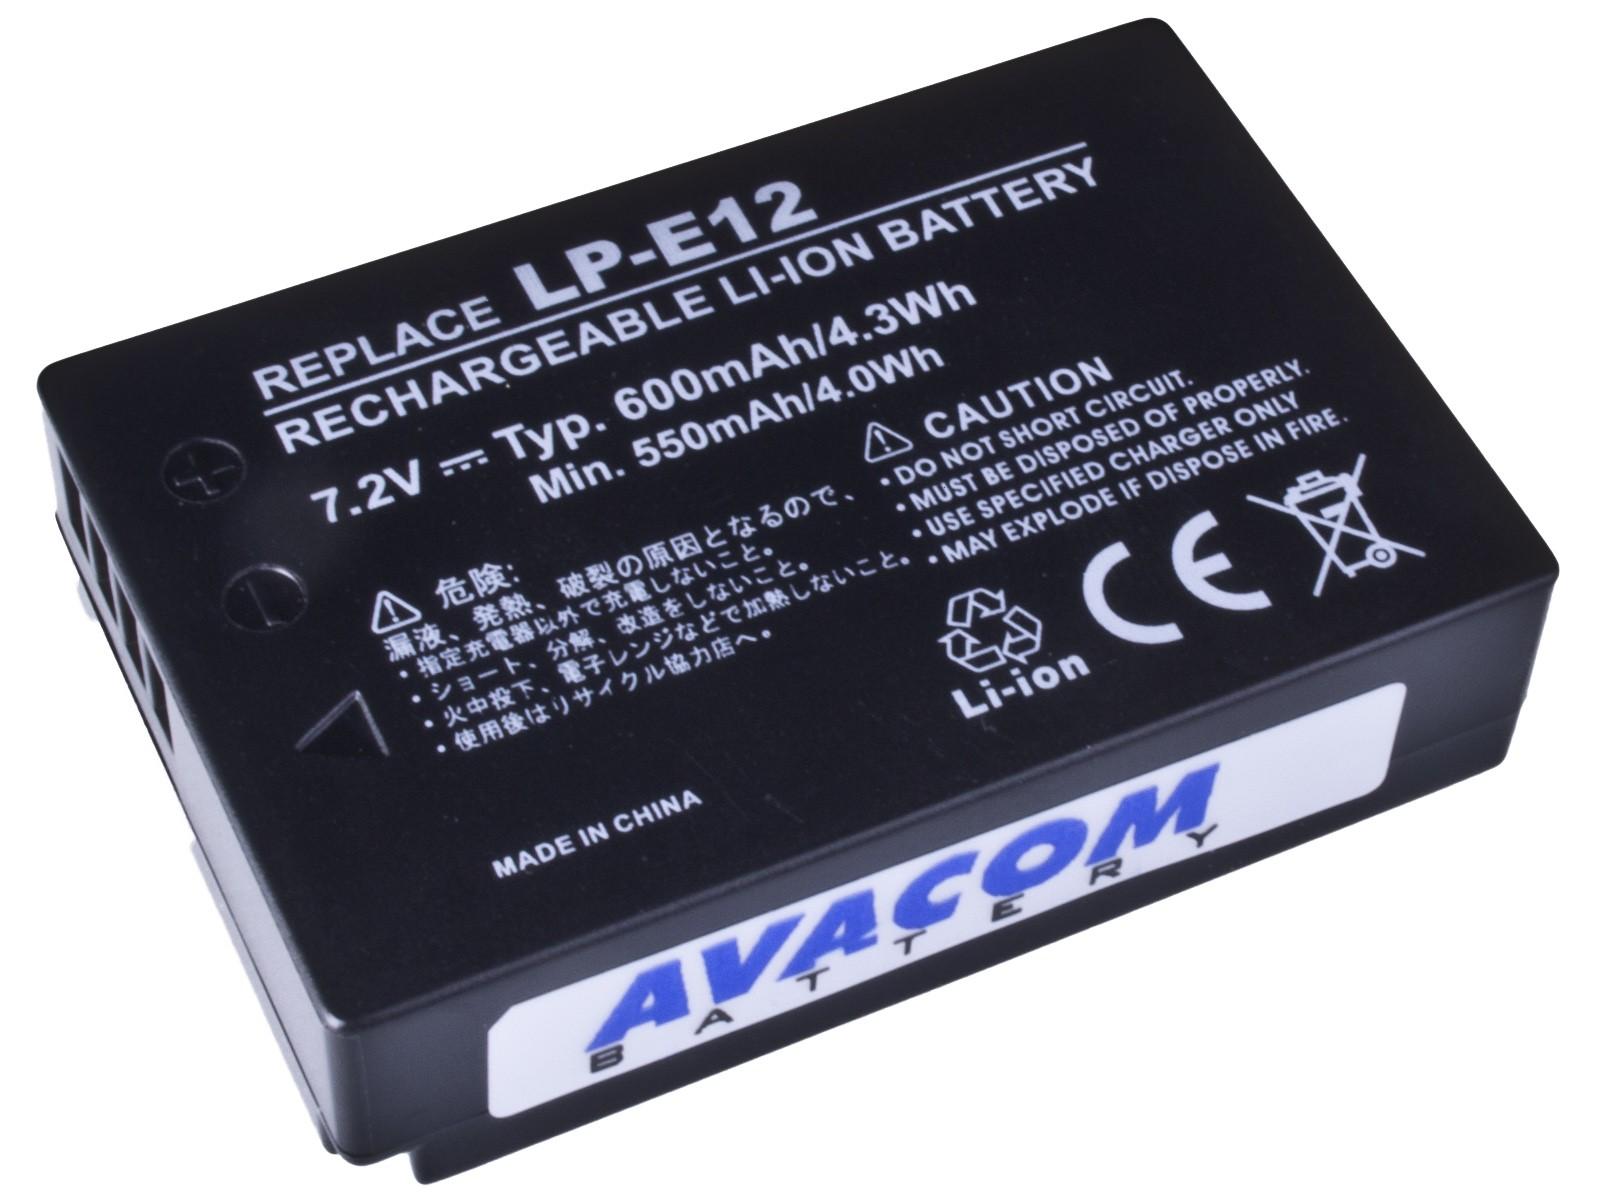 Náhradní baterie AVACOM Canon LP-E12 Li-Ion 7.4V 600mAh 4.3Wh